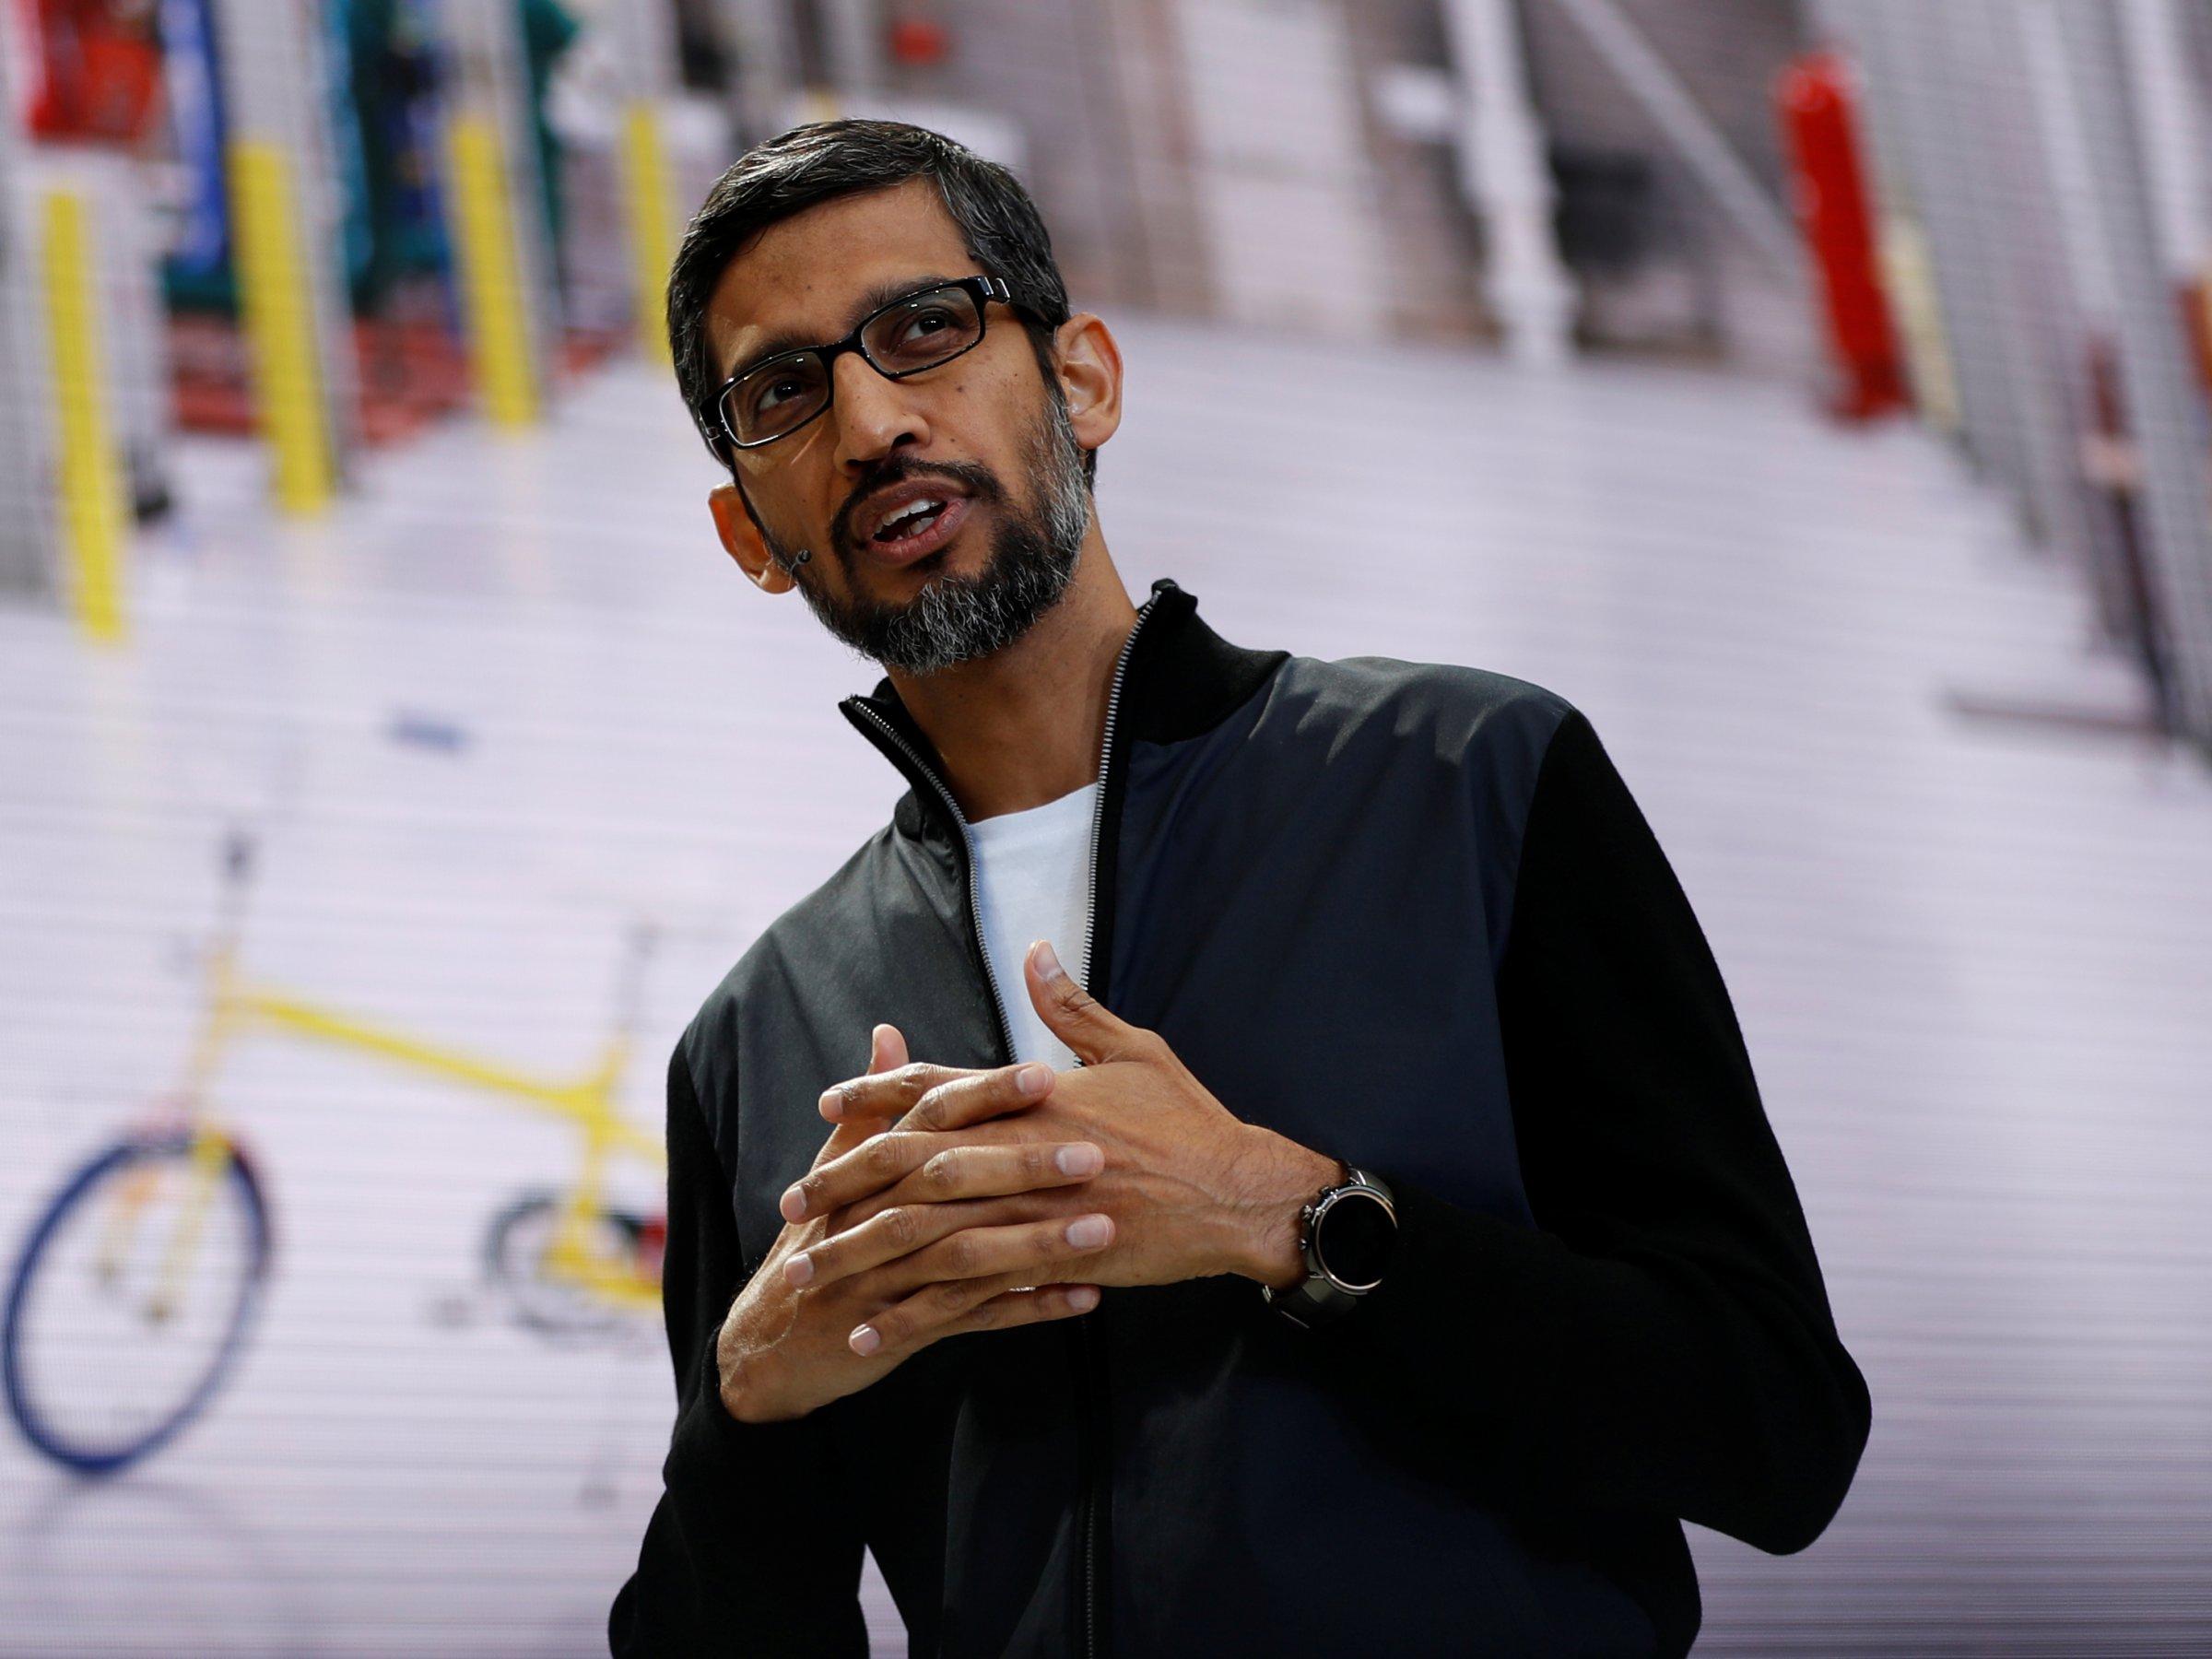 Google ShoGoogle Shoelace, google update, google shoelace vs facebook, google shoelace launch, google new service, googleelace, google update, google shoelace vs facebook, google shoelace launch, google new service, google